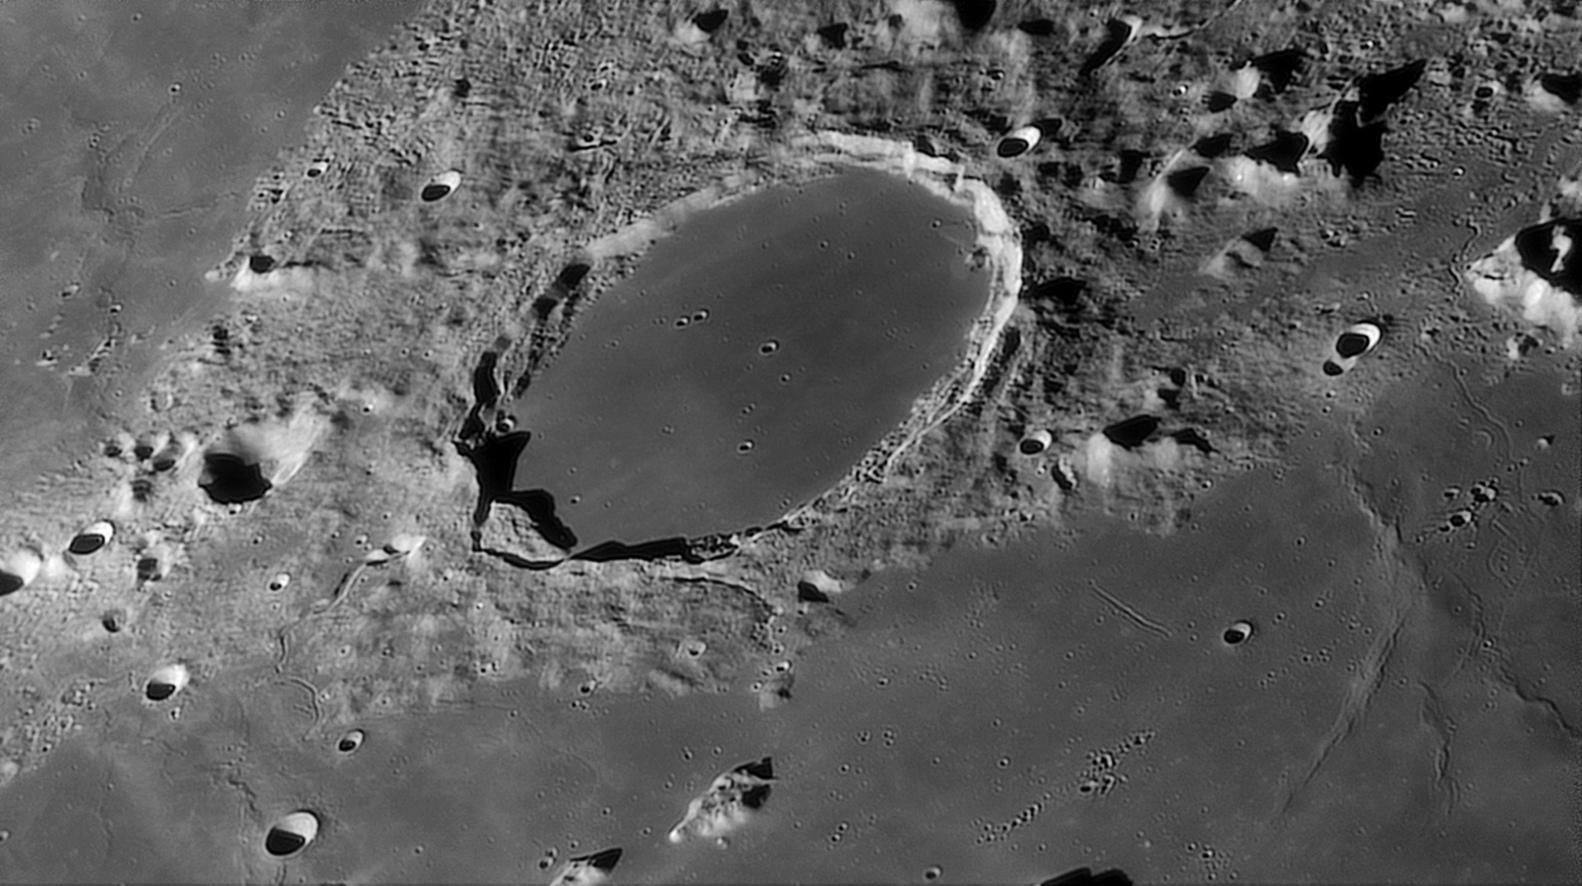 large.Moon_07_11_2020_R80.jpg.d83f03b6f4254655357535cadc002f55.jpg